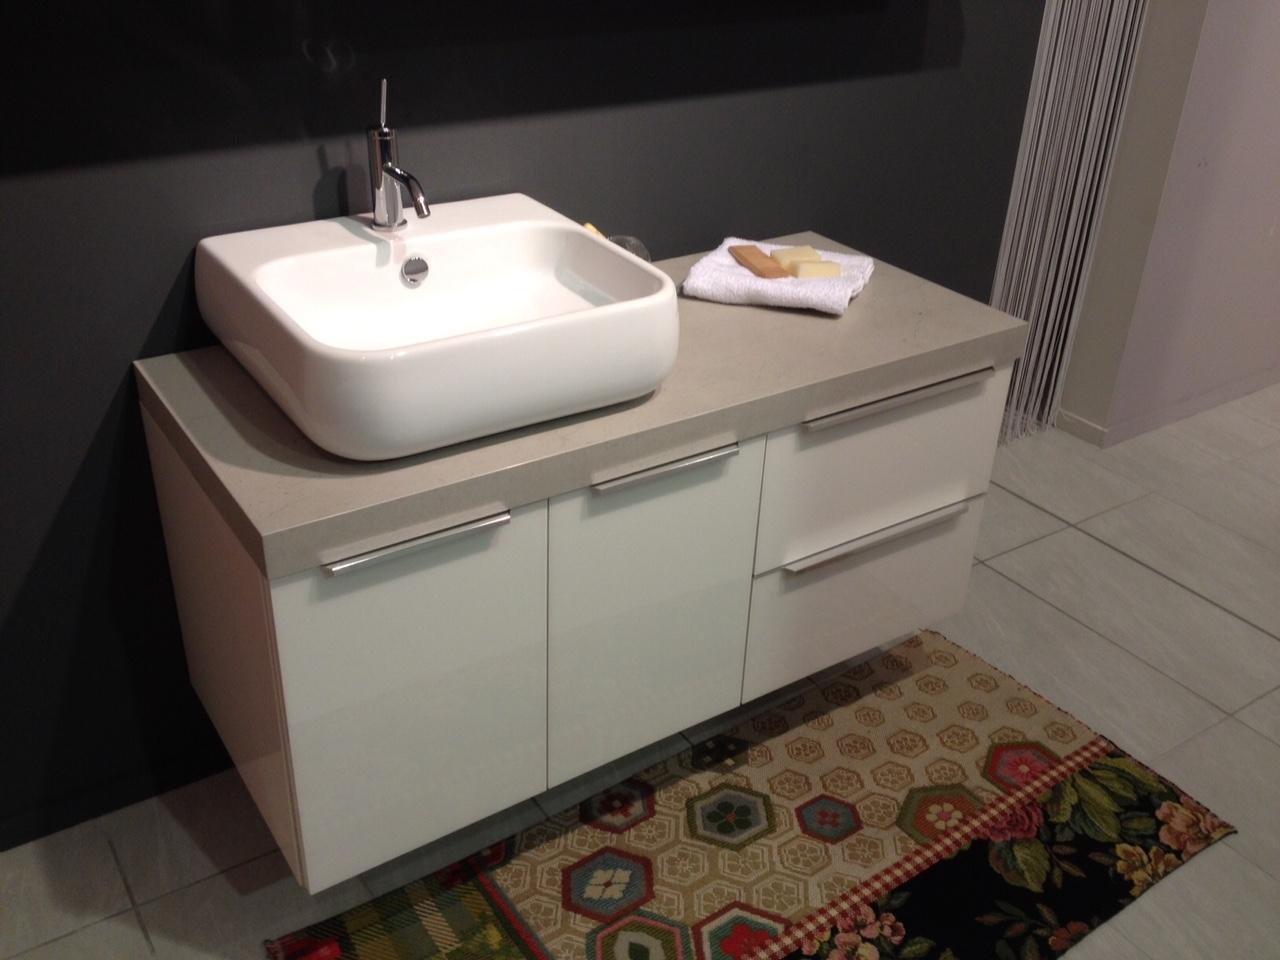 Arbi bagno prezzi design per la casa aradz.com